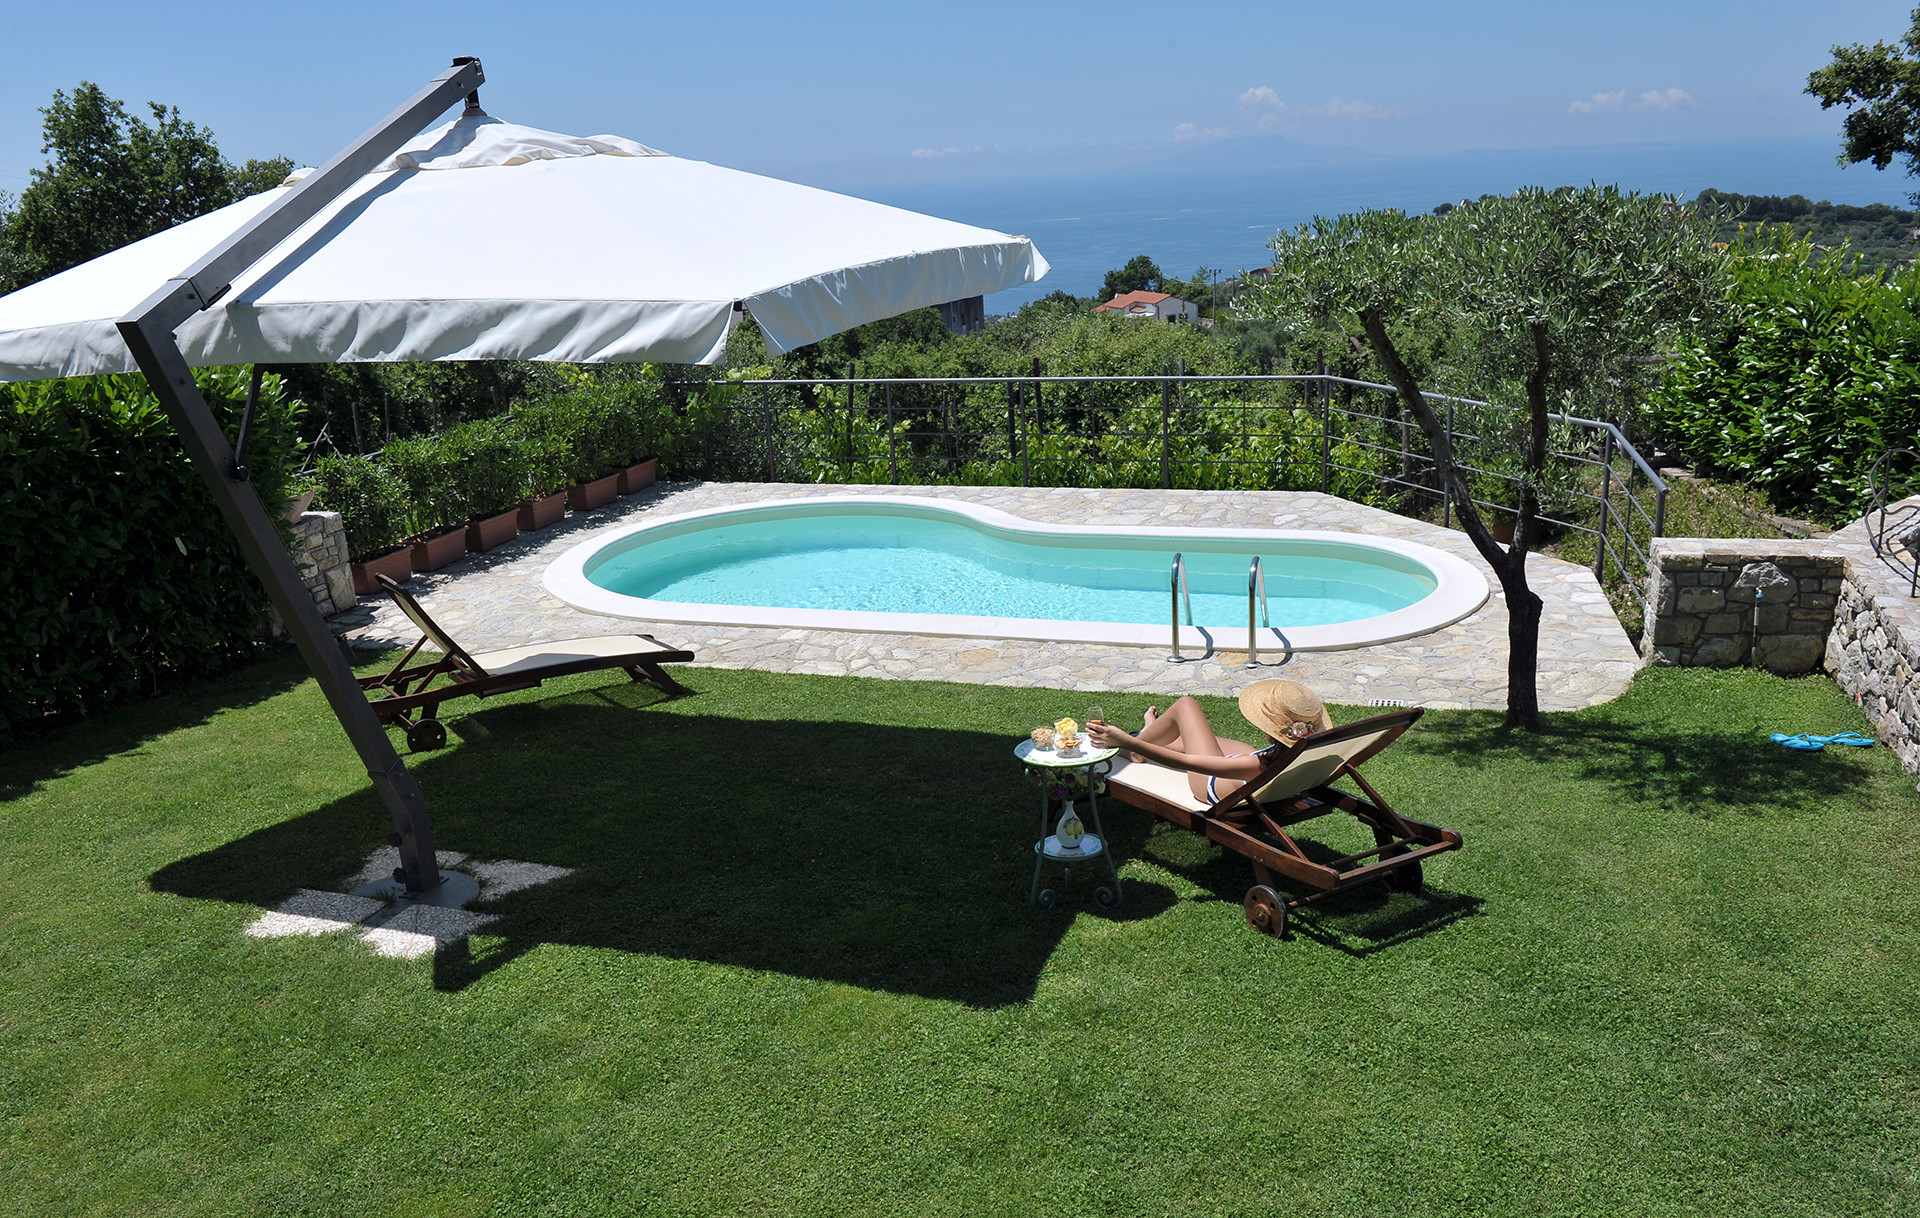 Casa Nando Sant Agata Sui Due Golfi Penisola Sorrentina Amore Rentals